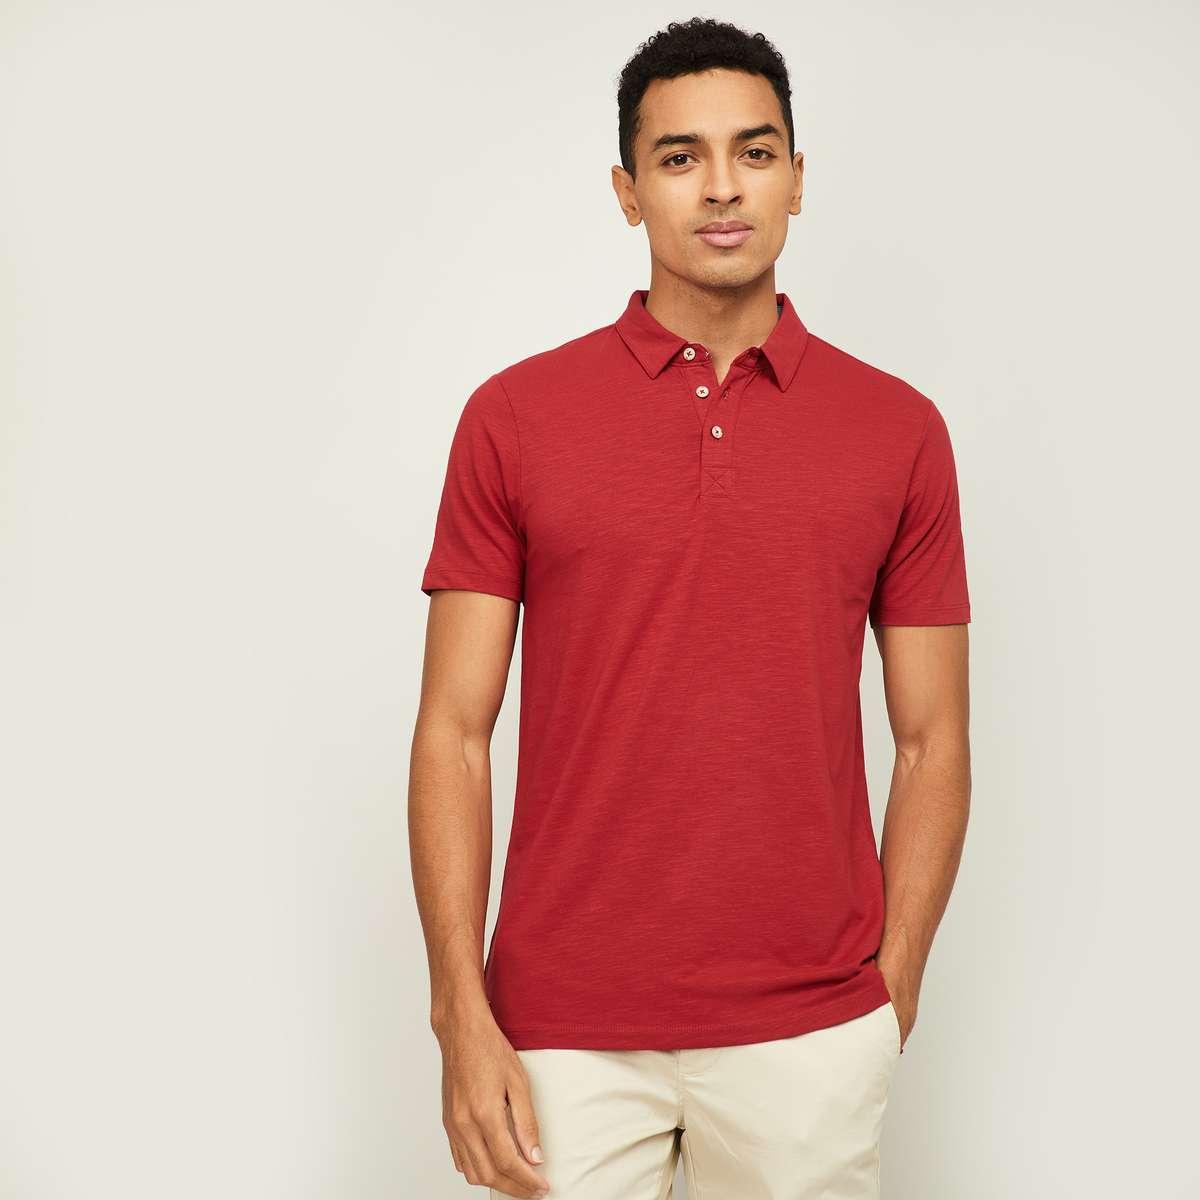 6.FORCA Men Solid Regular Fit Polo T-shirt